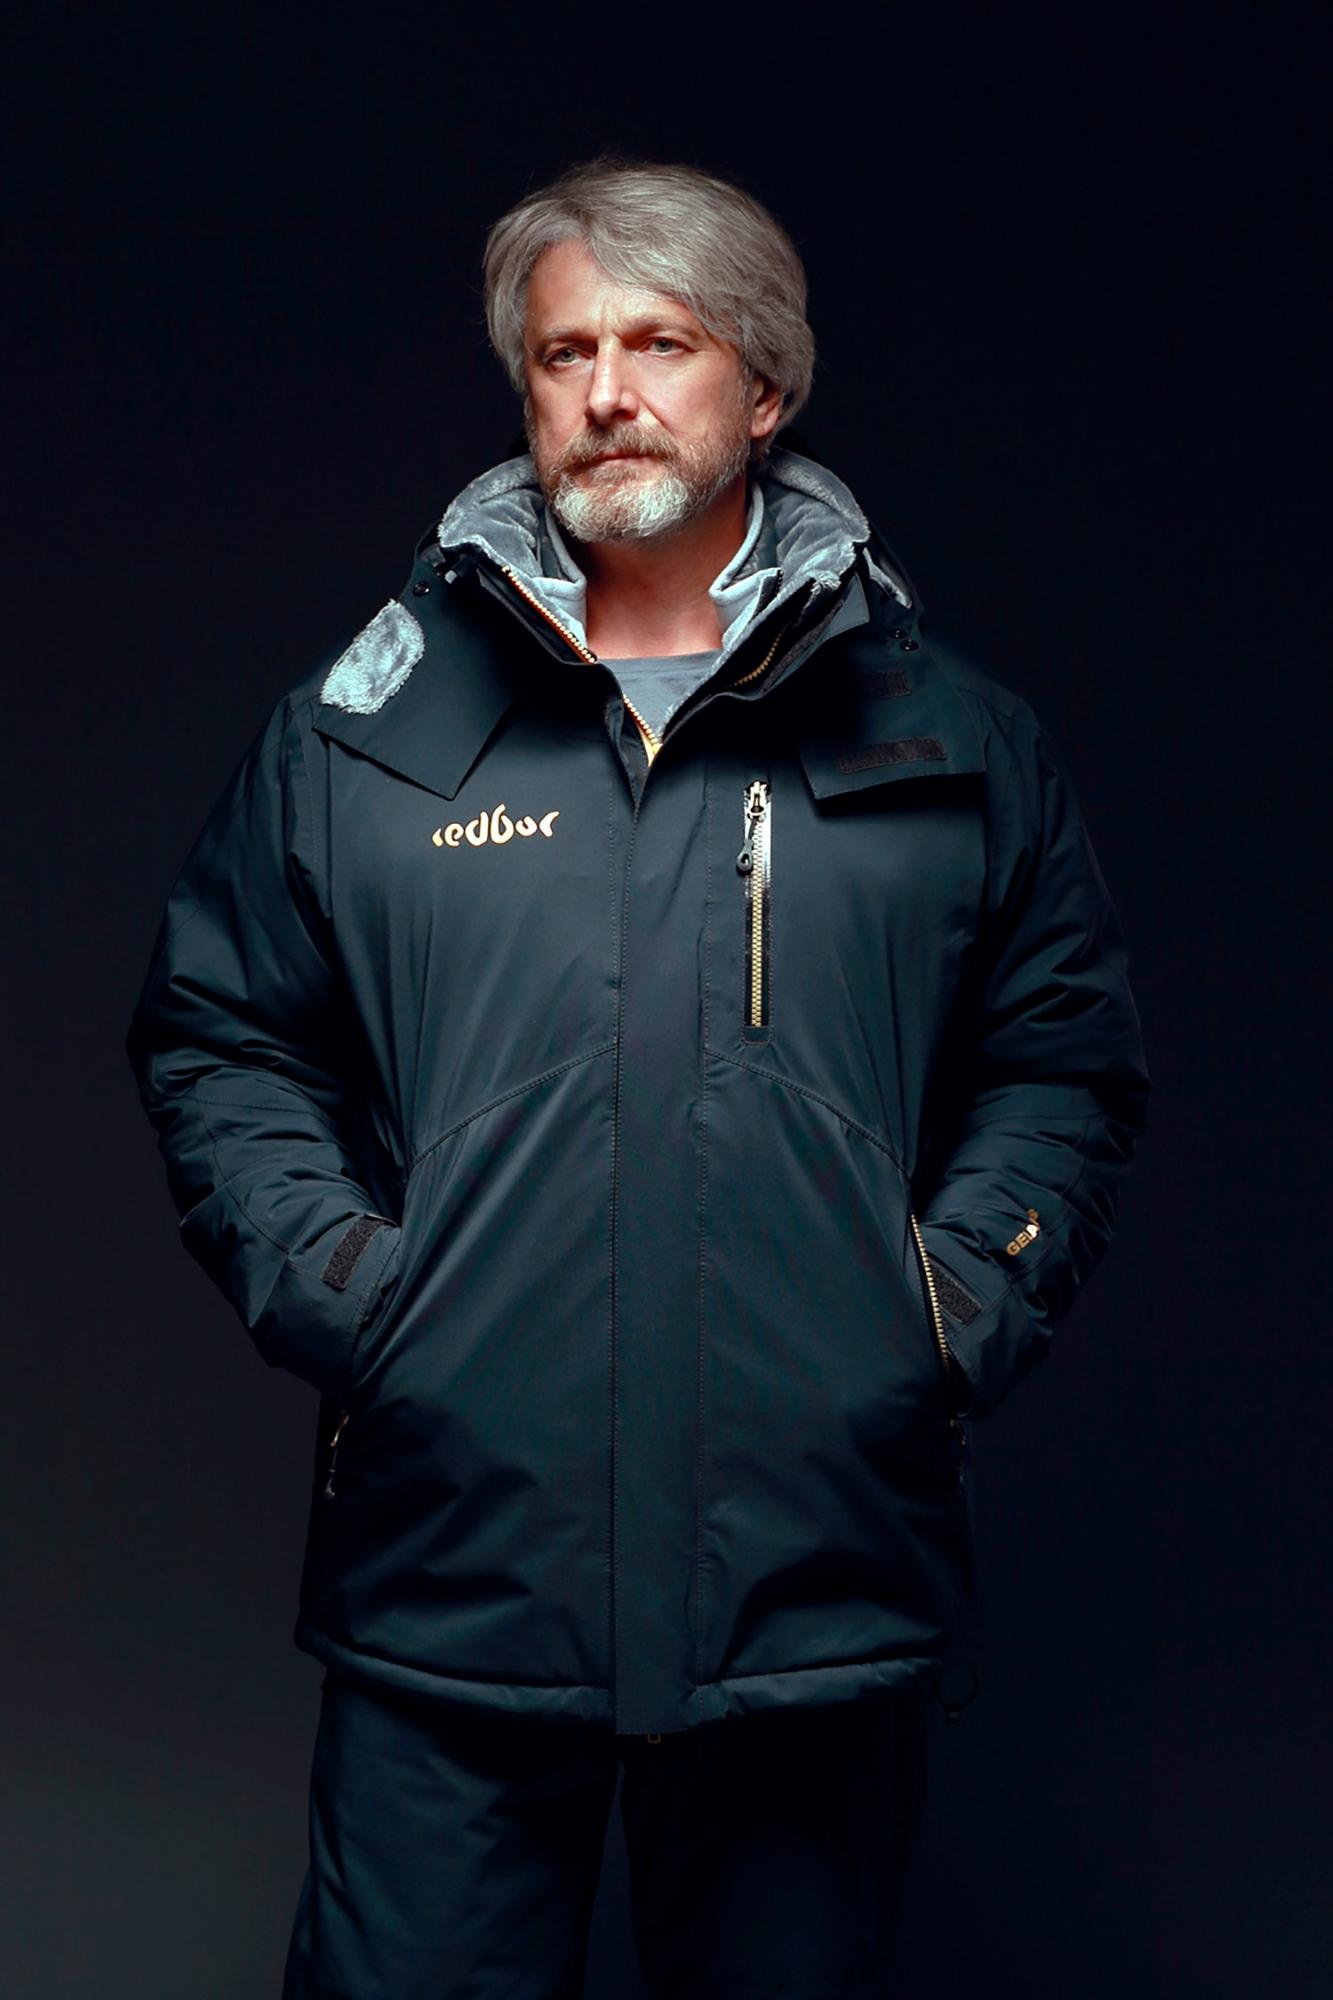 e66e220a Куртка Personaliter Redbor - купить онлайн у производителя | Redbor BIZ